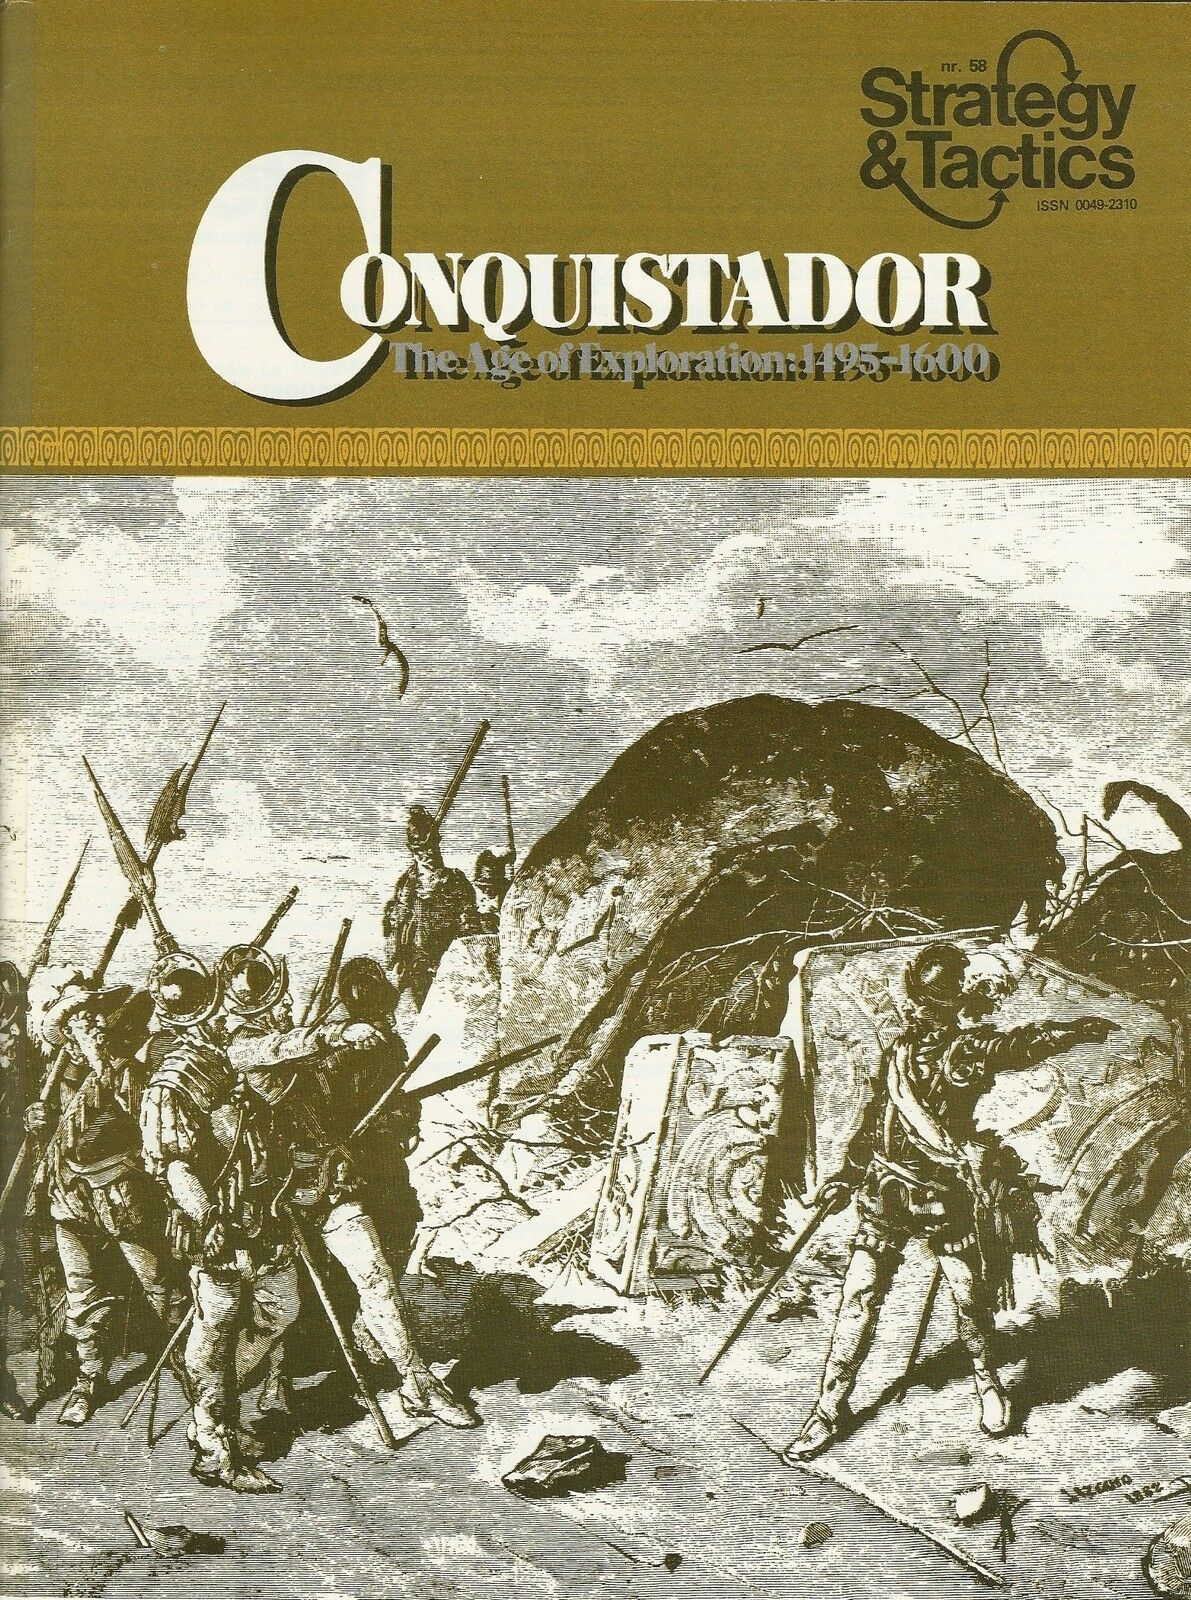 Strategy & Tactics S&T Conquidtador Age of Exploration Solo Unpunched  FS